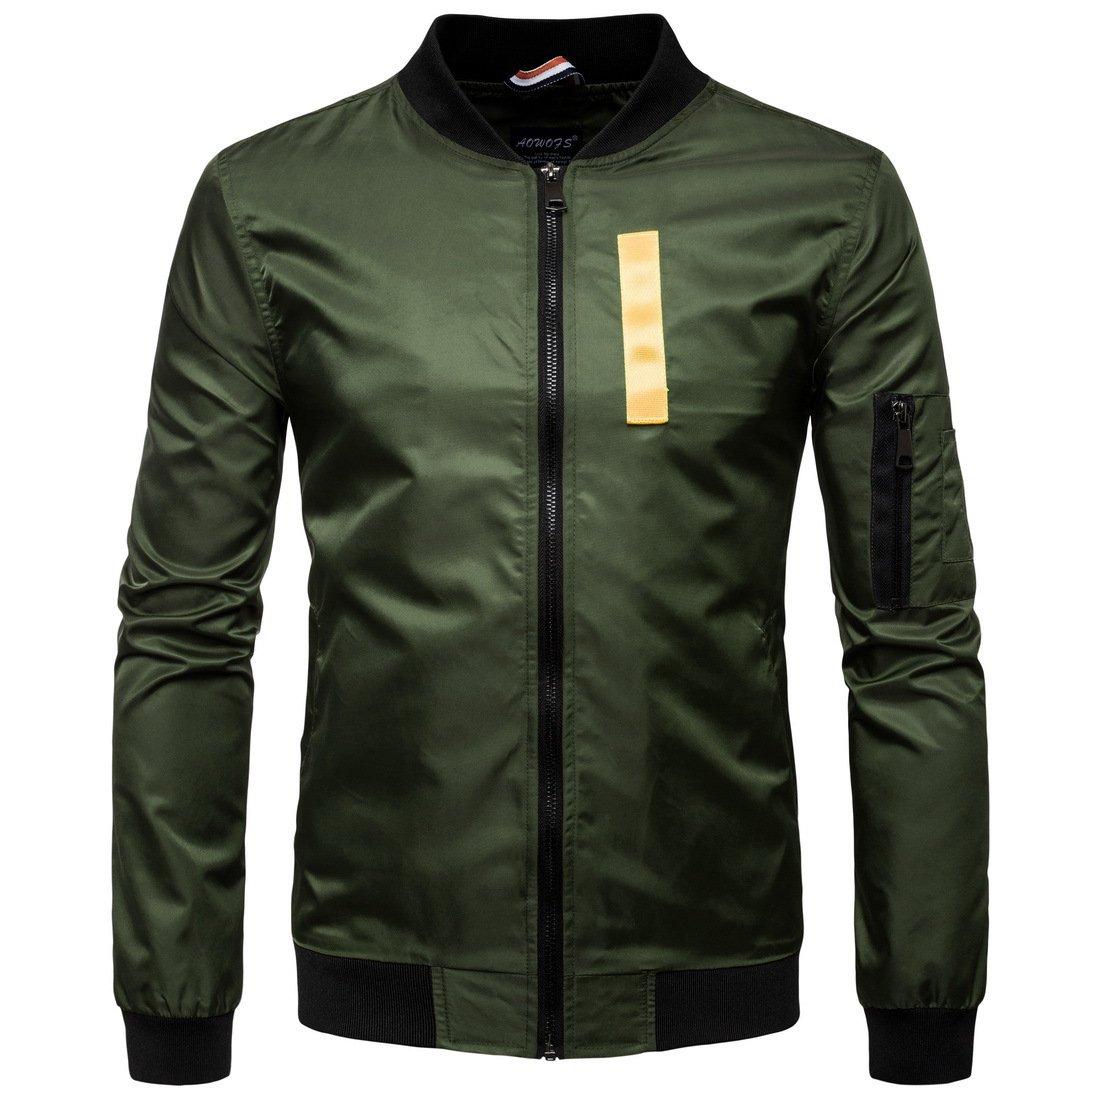 Männer - Mode - Kragen Farbe,Army Grün,The